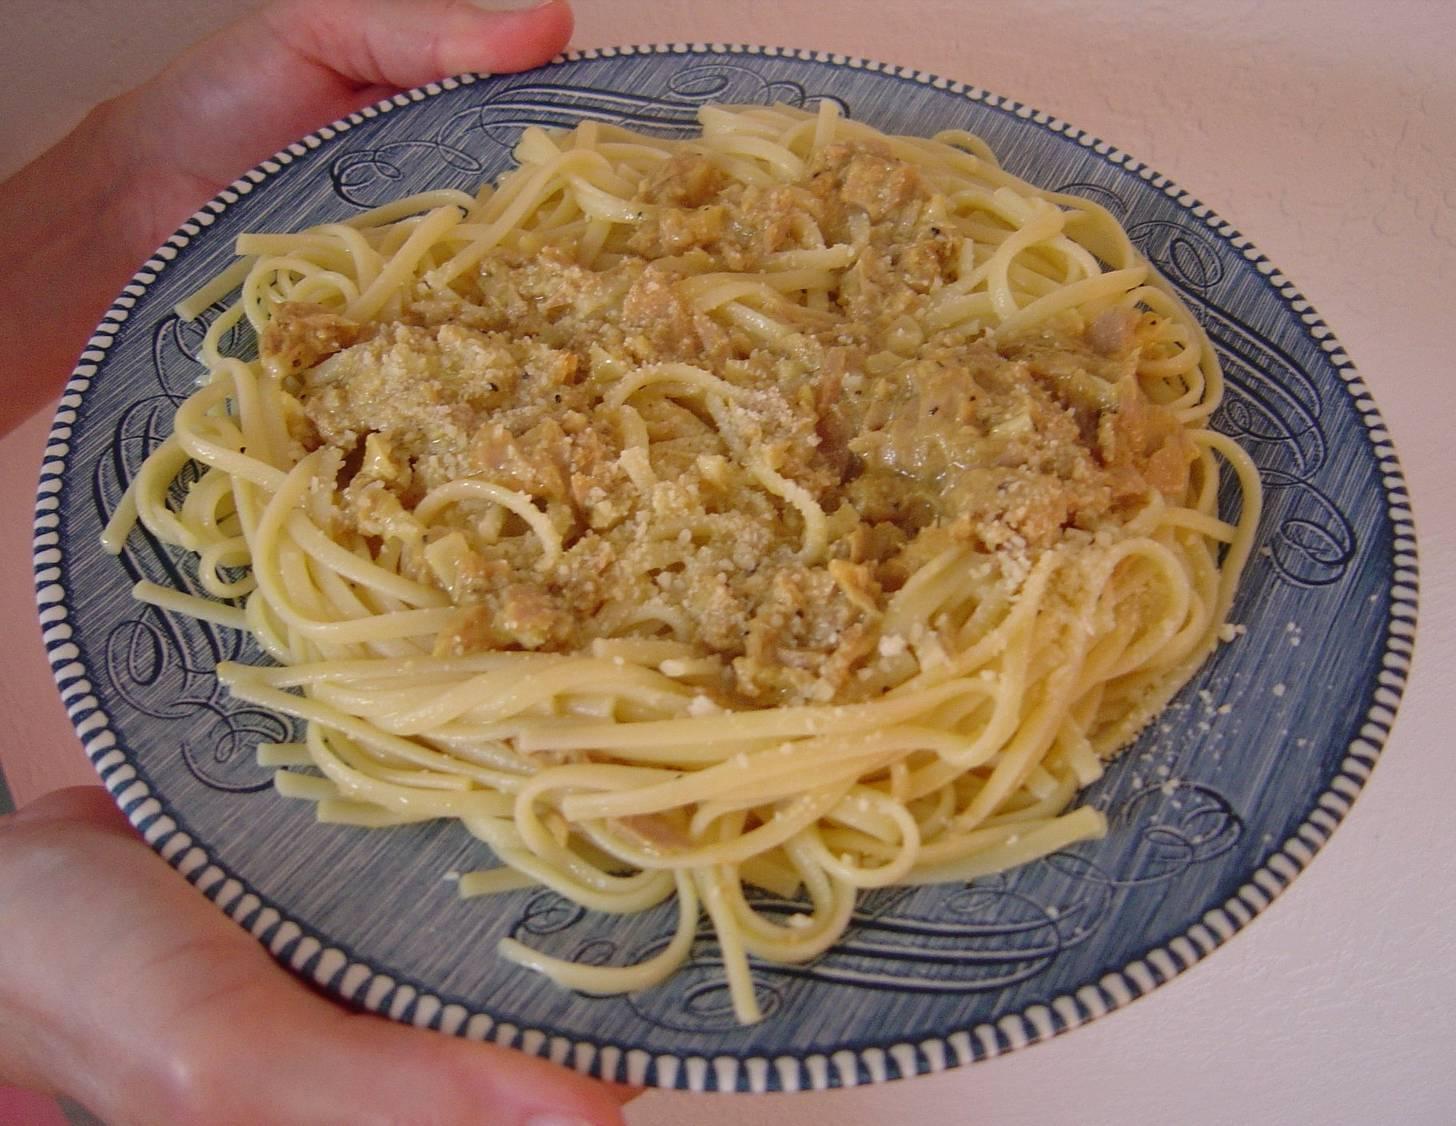 Plate of my No Work Tuna Spaghetti